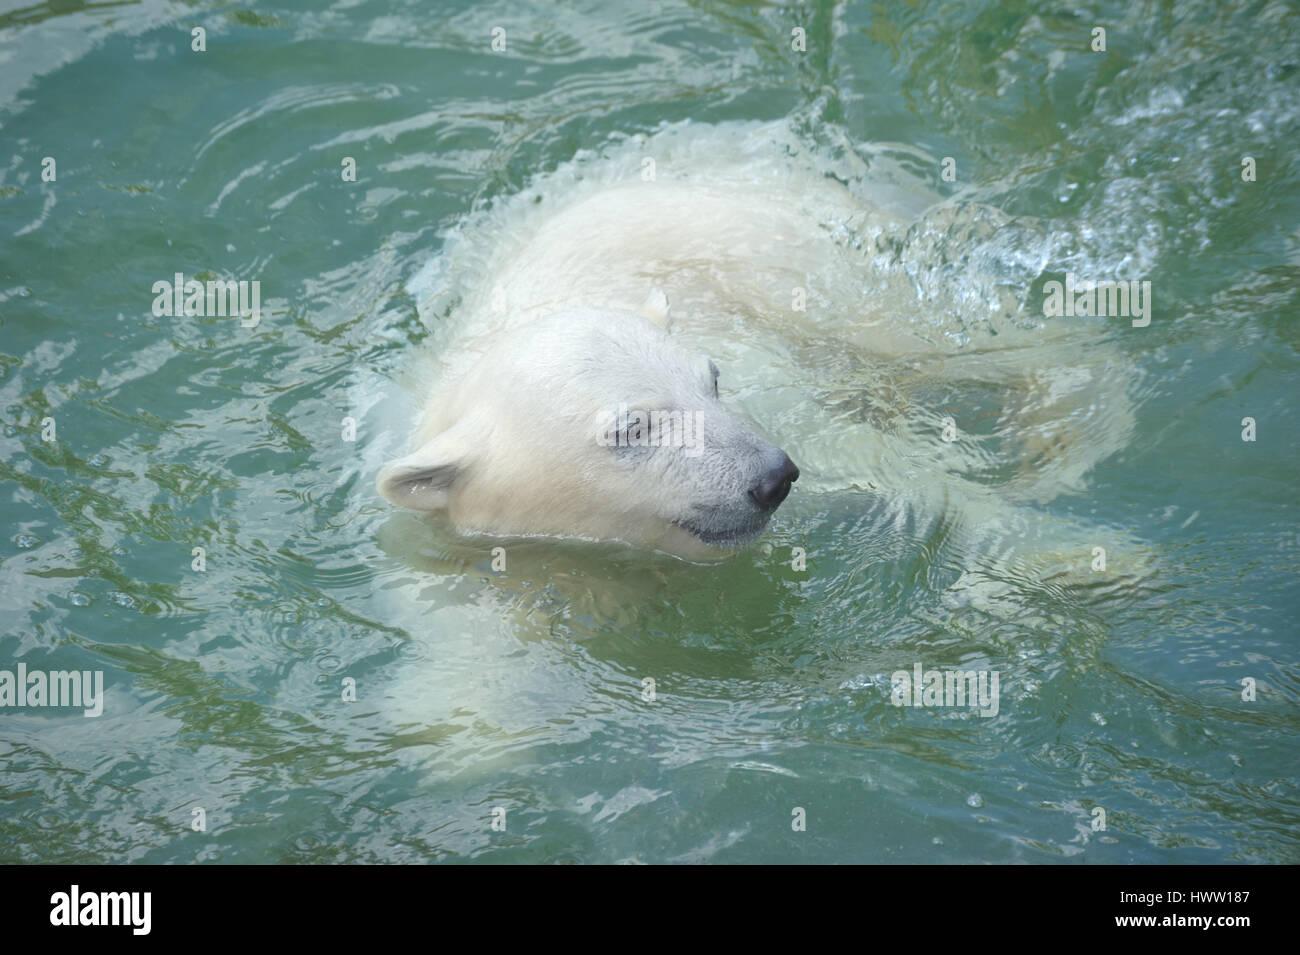 Polar bear swimming in ocean - photo#42